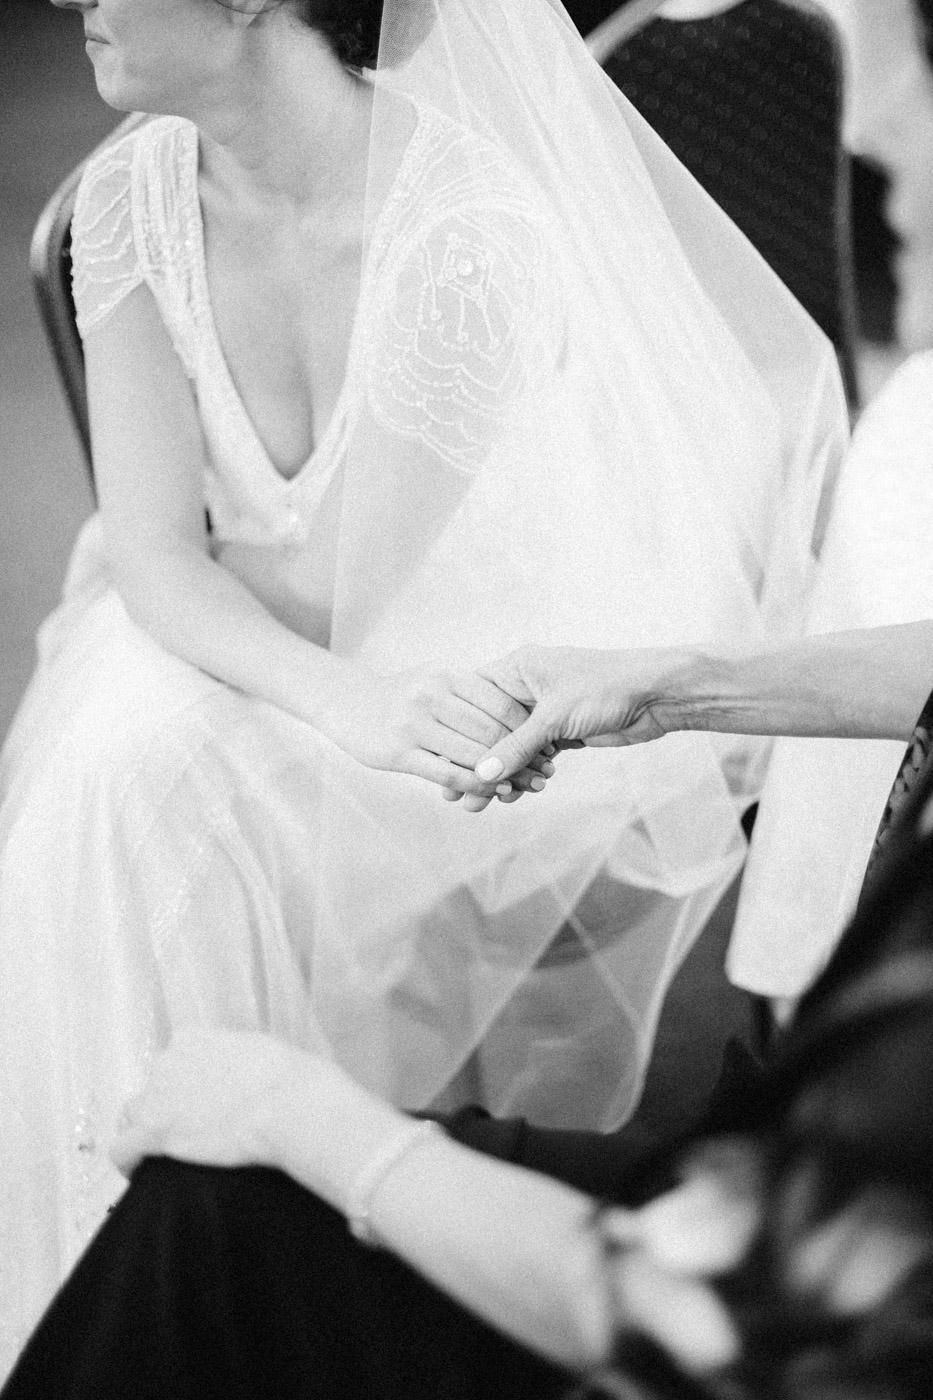 toronto_wedding_photographer_the_great_hall-55.jpg